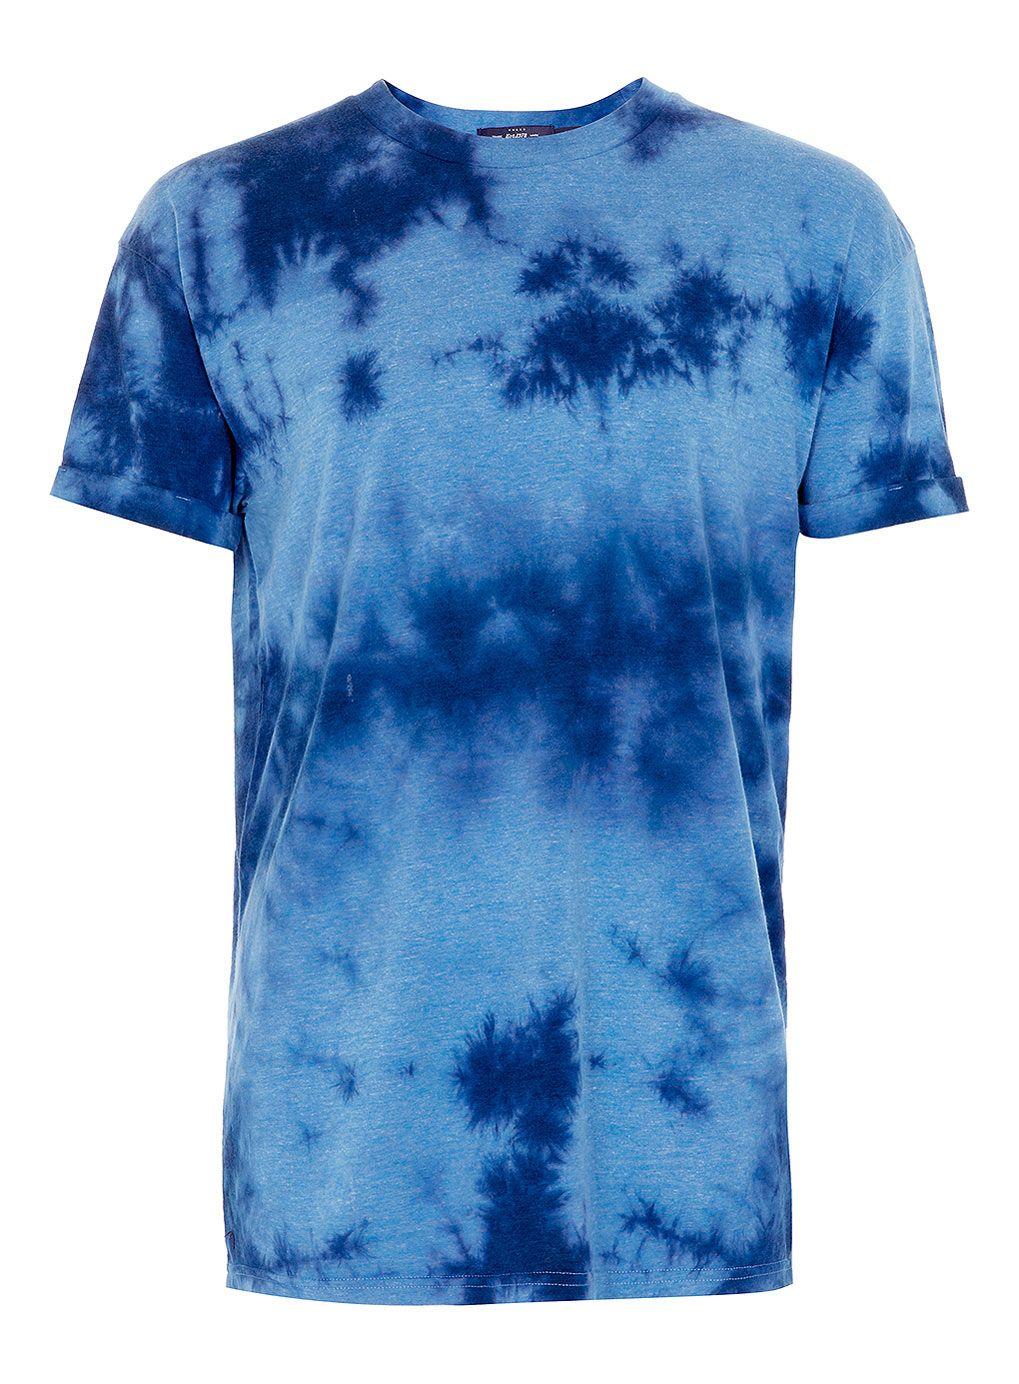 BLUE MARL OVERSIZE TIE DYE T-SHIRT - Topman price: £20.00